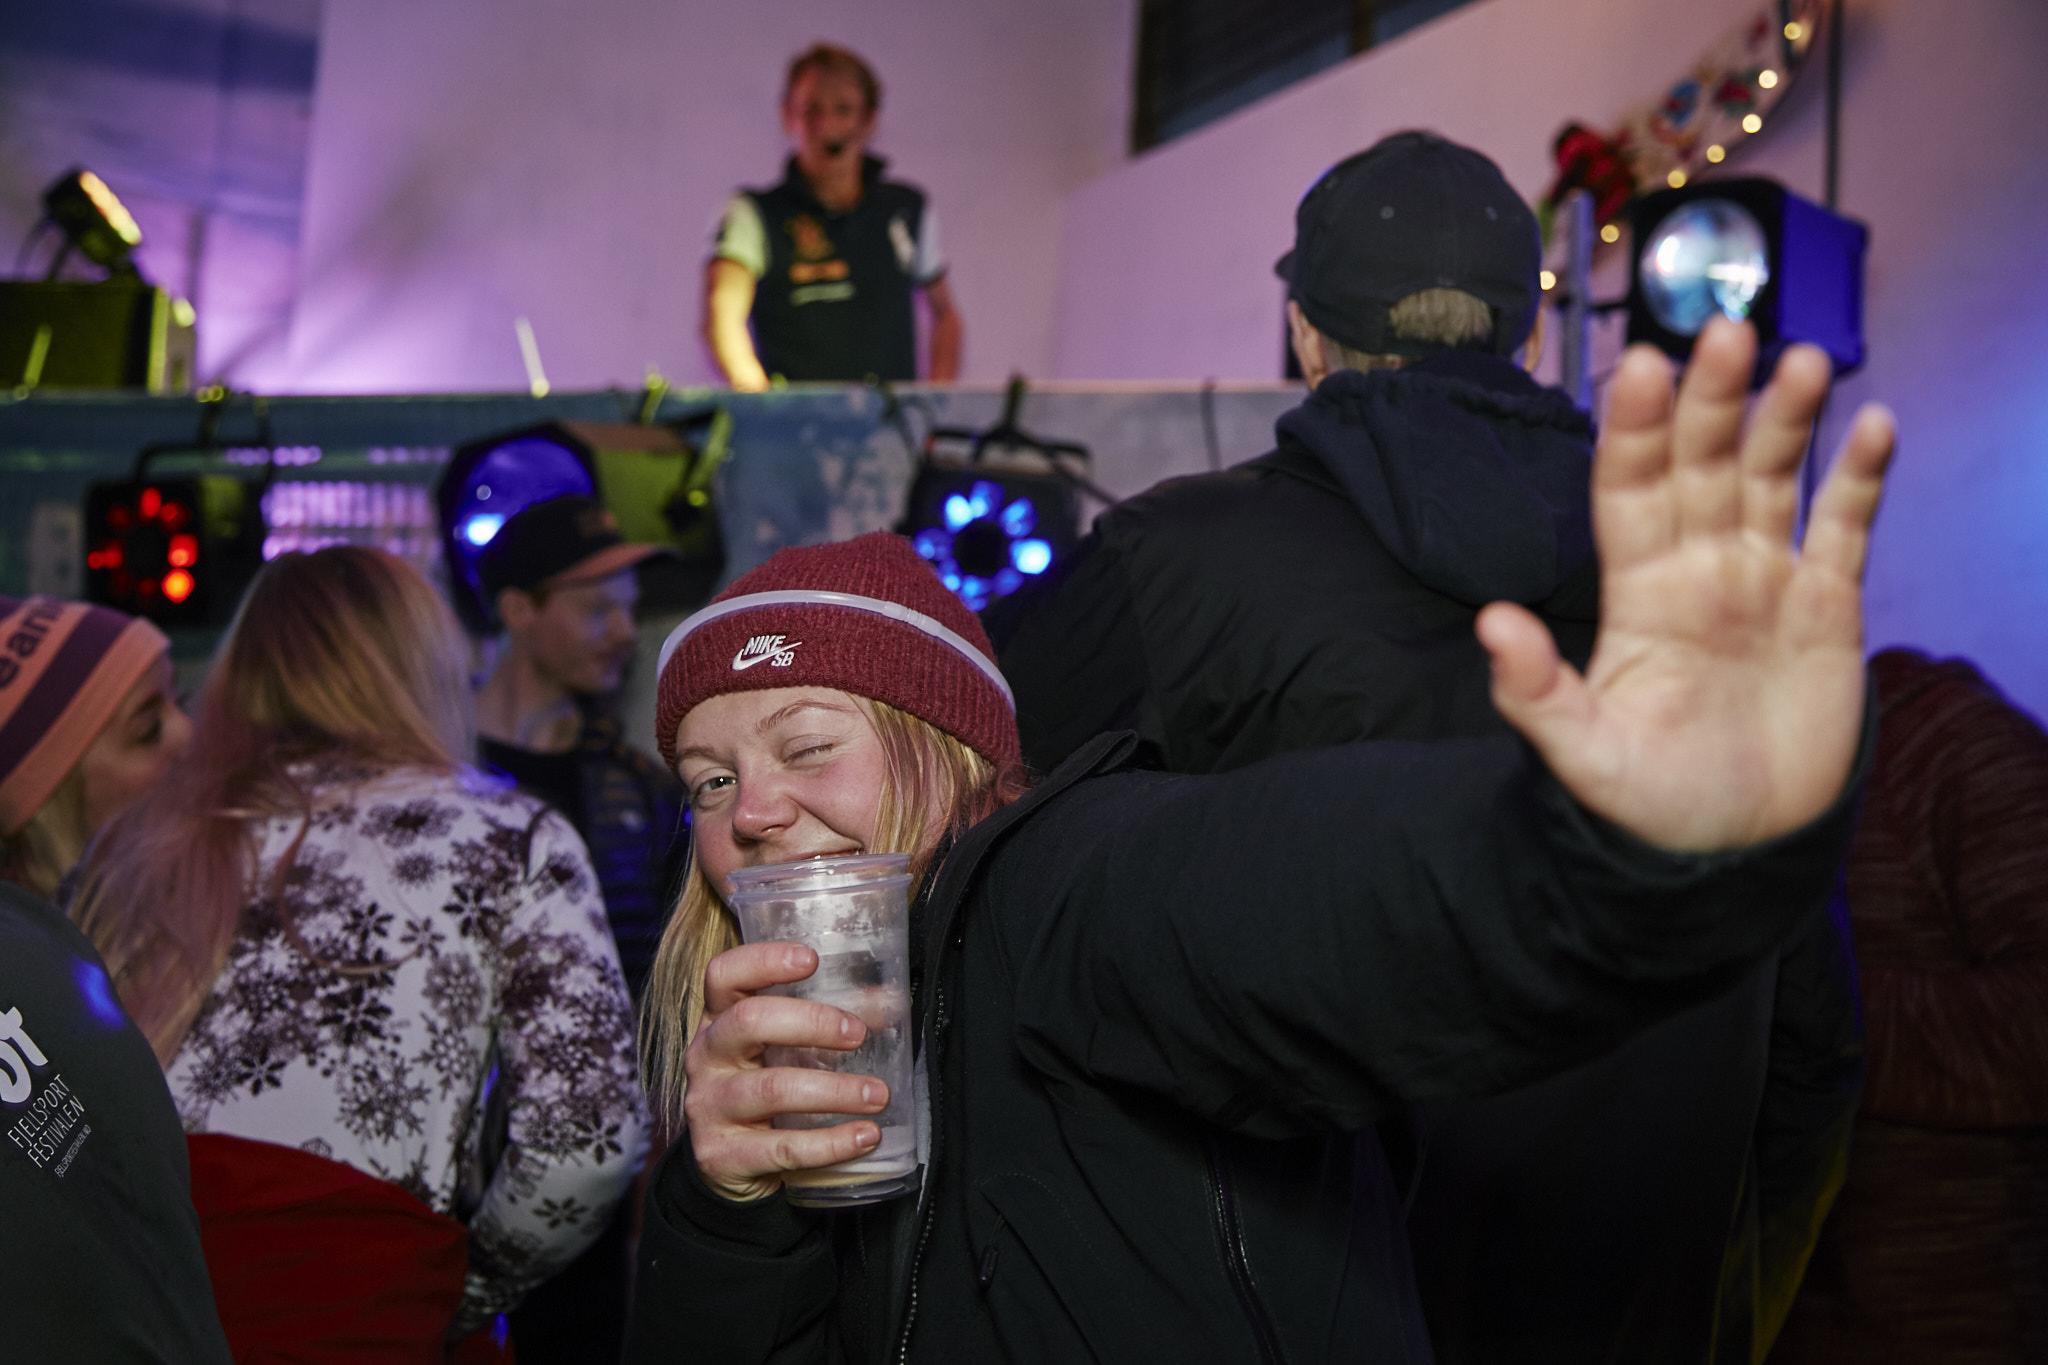 2018.02.22-Fjellsportfestival-Afterski-023.jpg